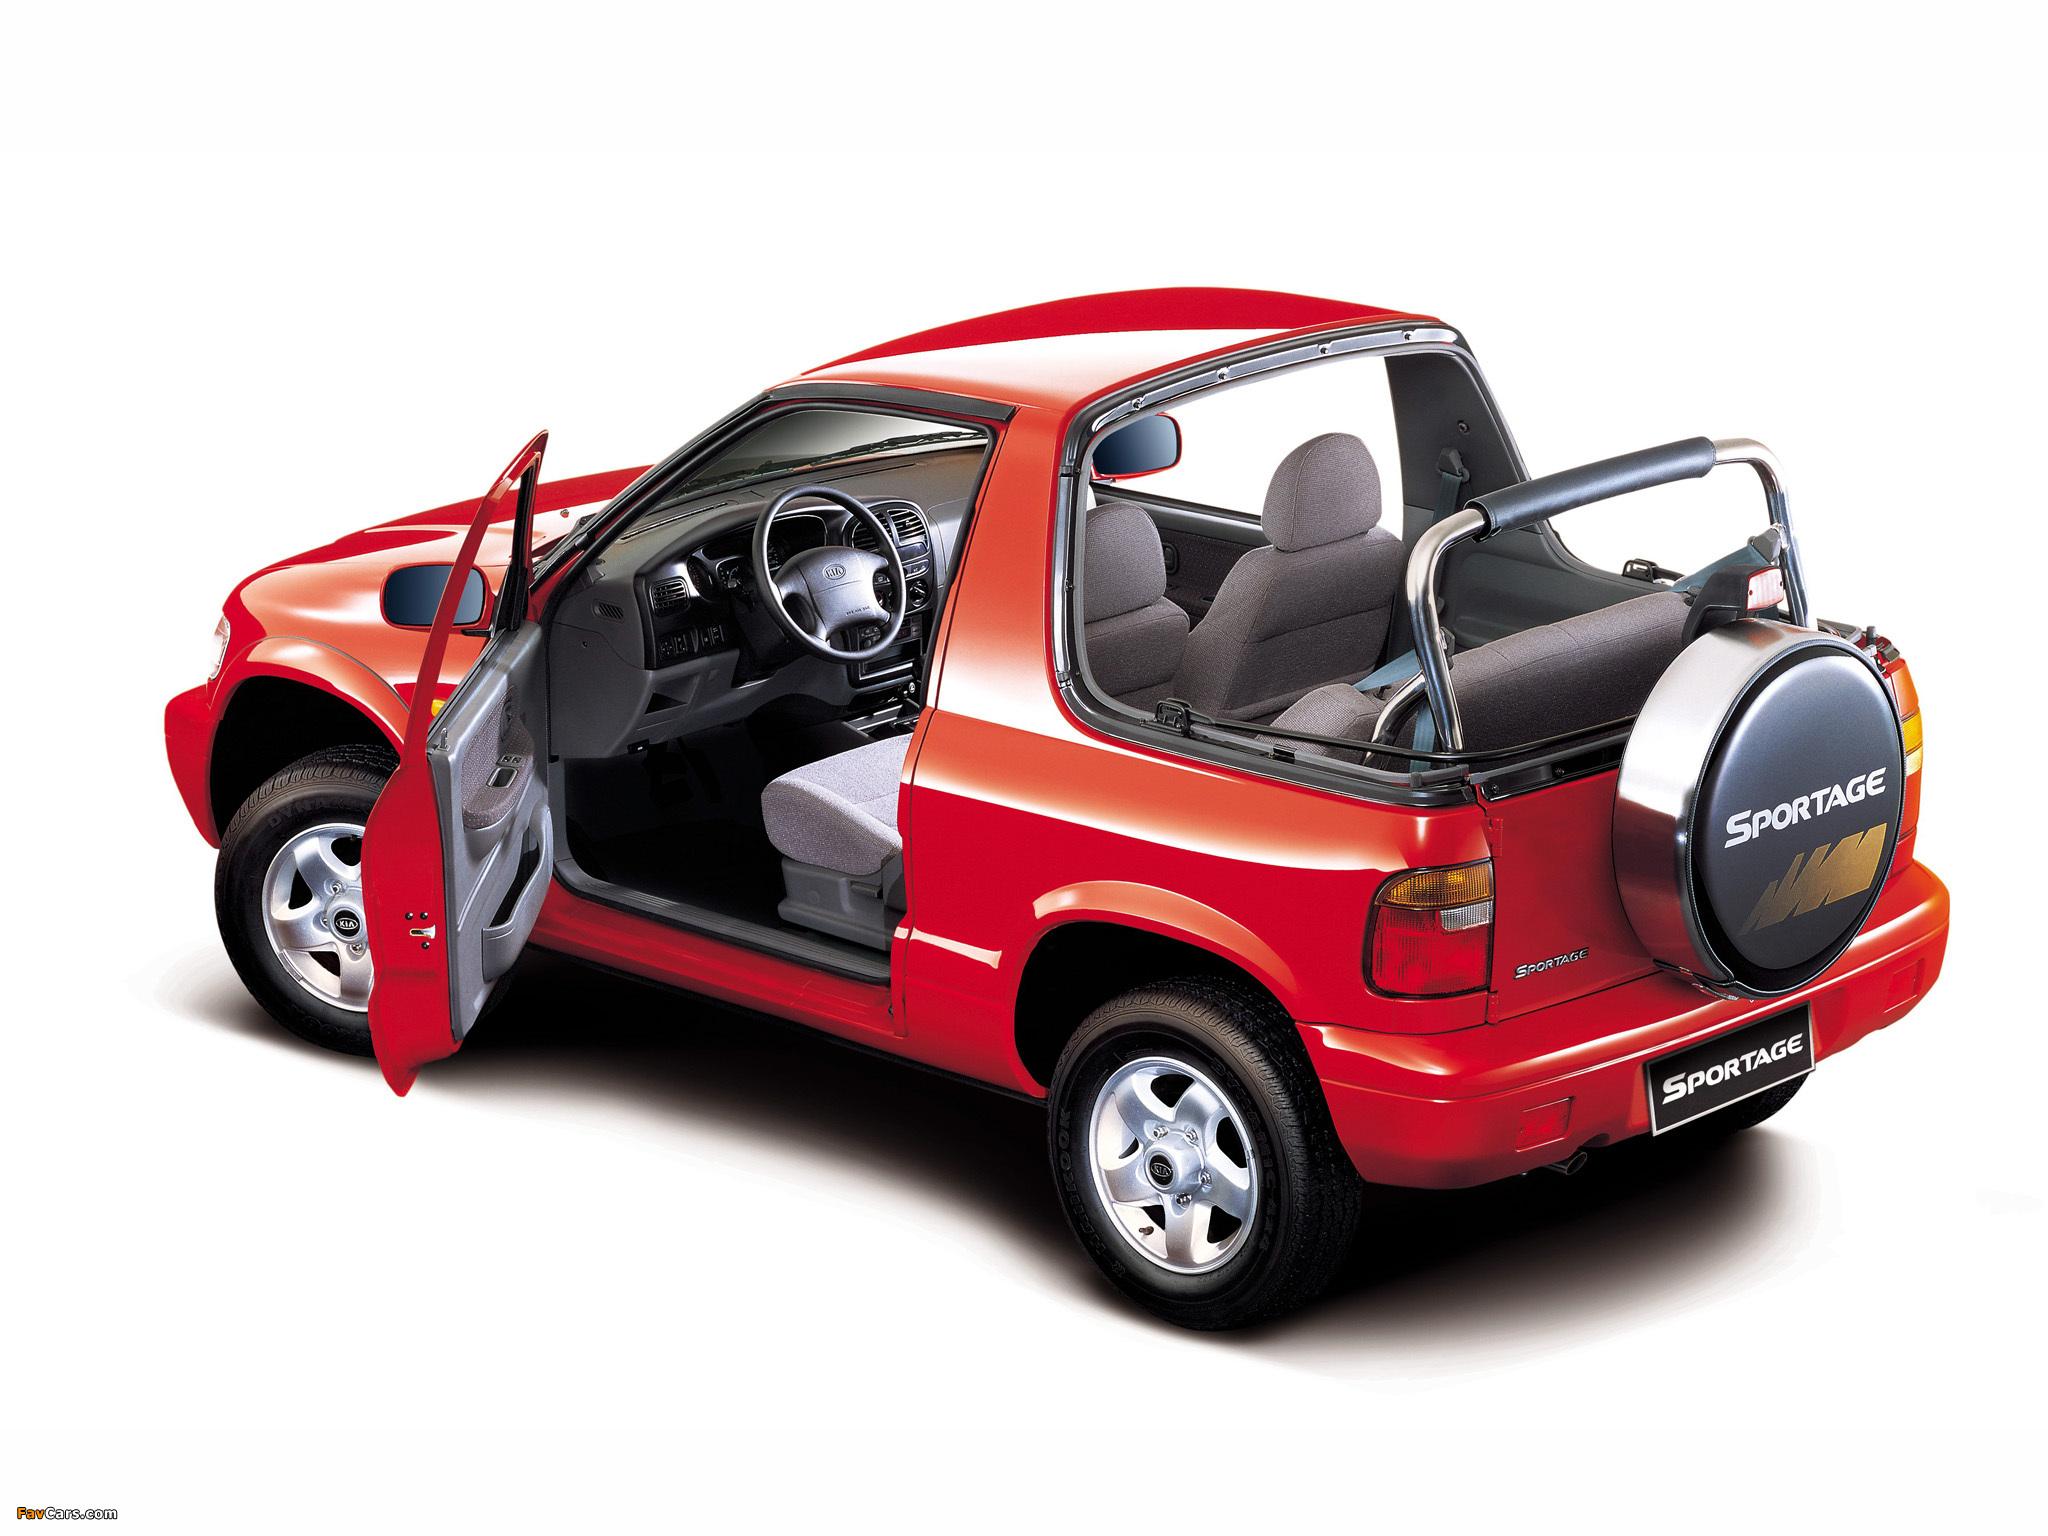 Kia Sportage Convertible 1998–2002 images (2048x1536)